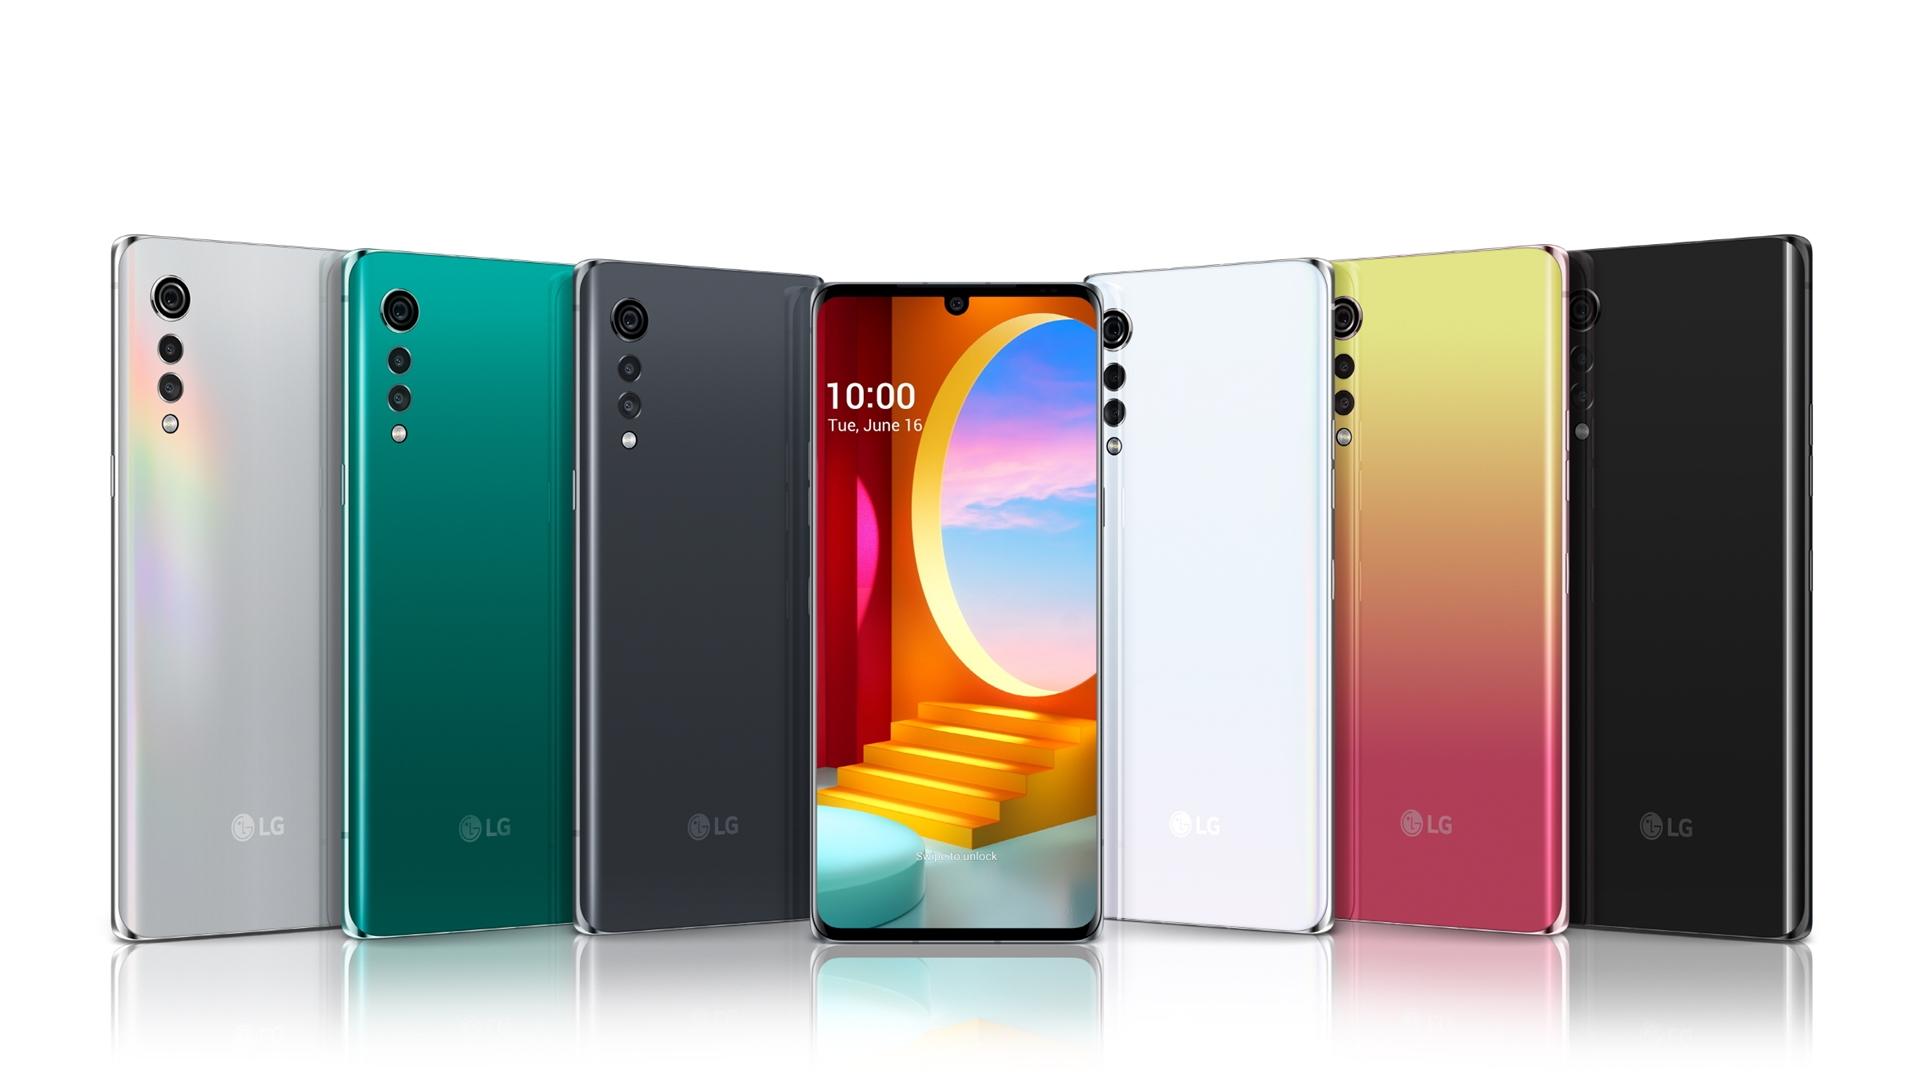 LG전자가 높은 편의성으로 호평받은 LG 벨벳(LG VELVET) UI(User Interface)를 LG 스마트폰의 다른 모델로 확대 적용한다. LG 벨벳 제품 사진.